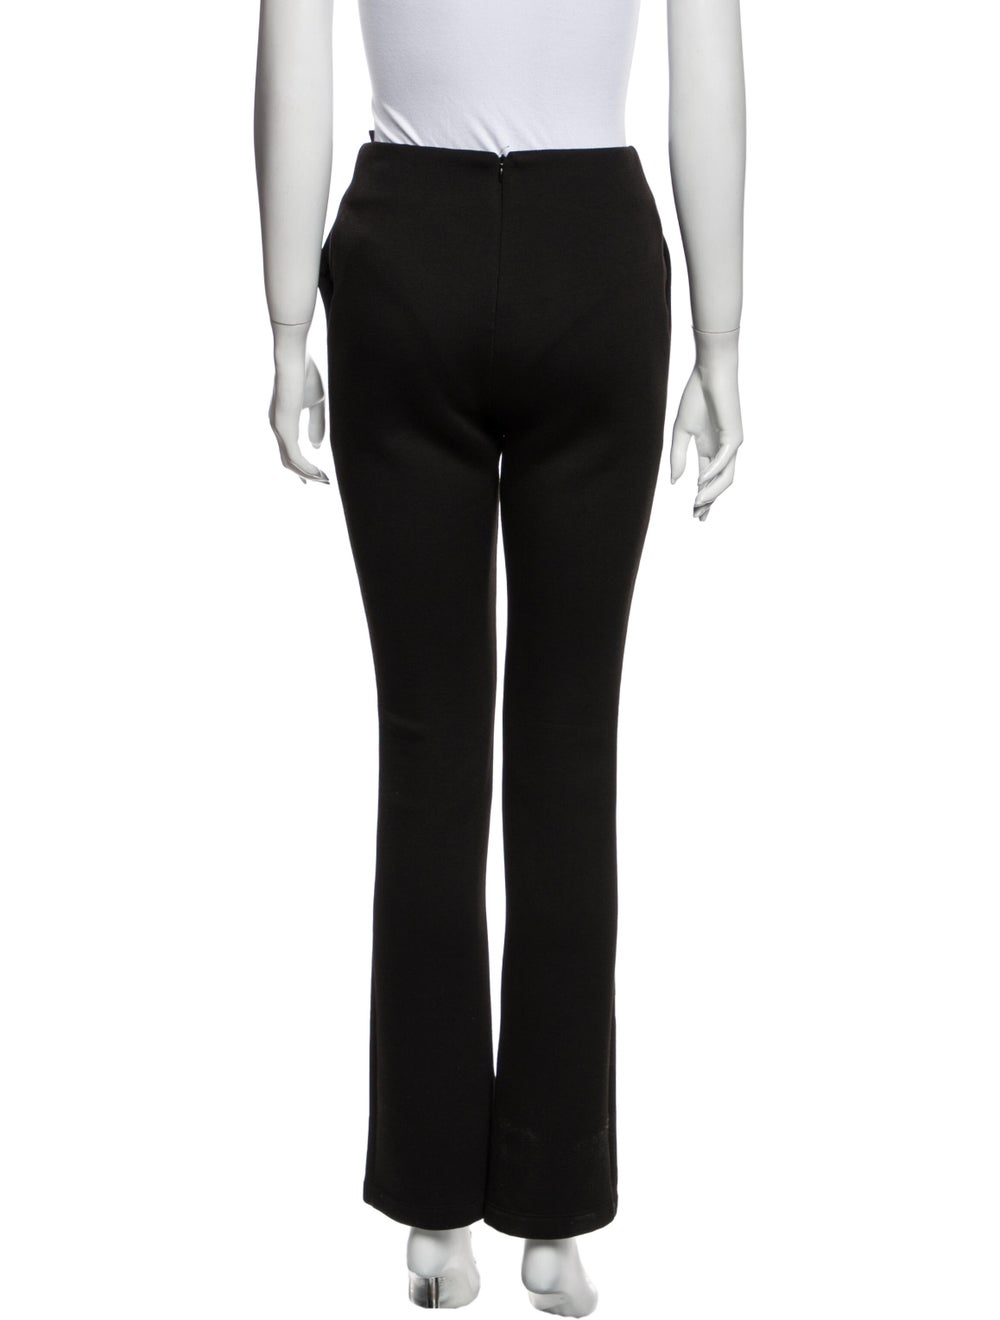 Beaufille Straight Leg Pants Black - image 3